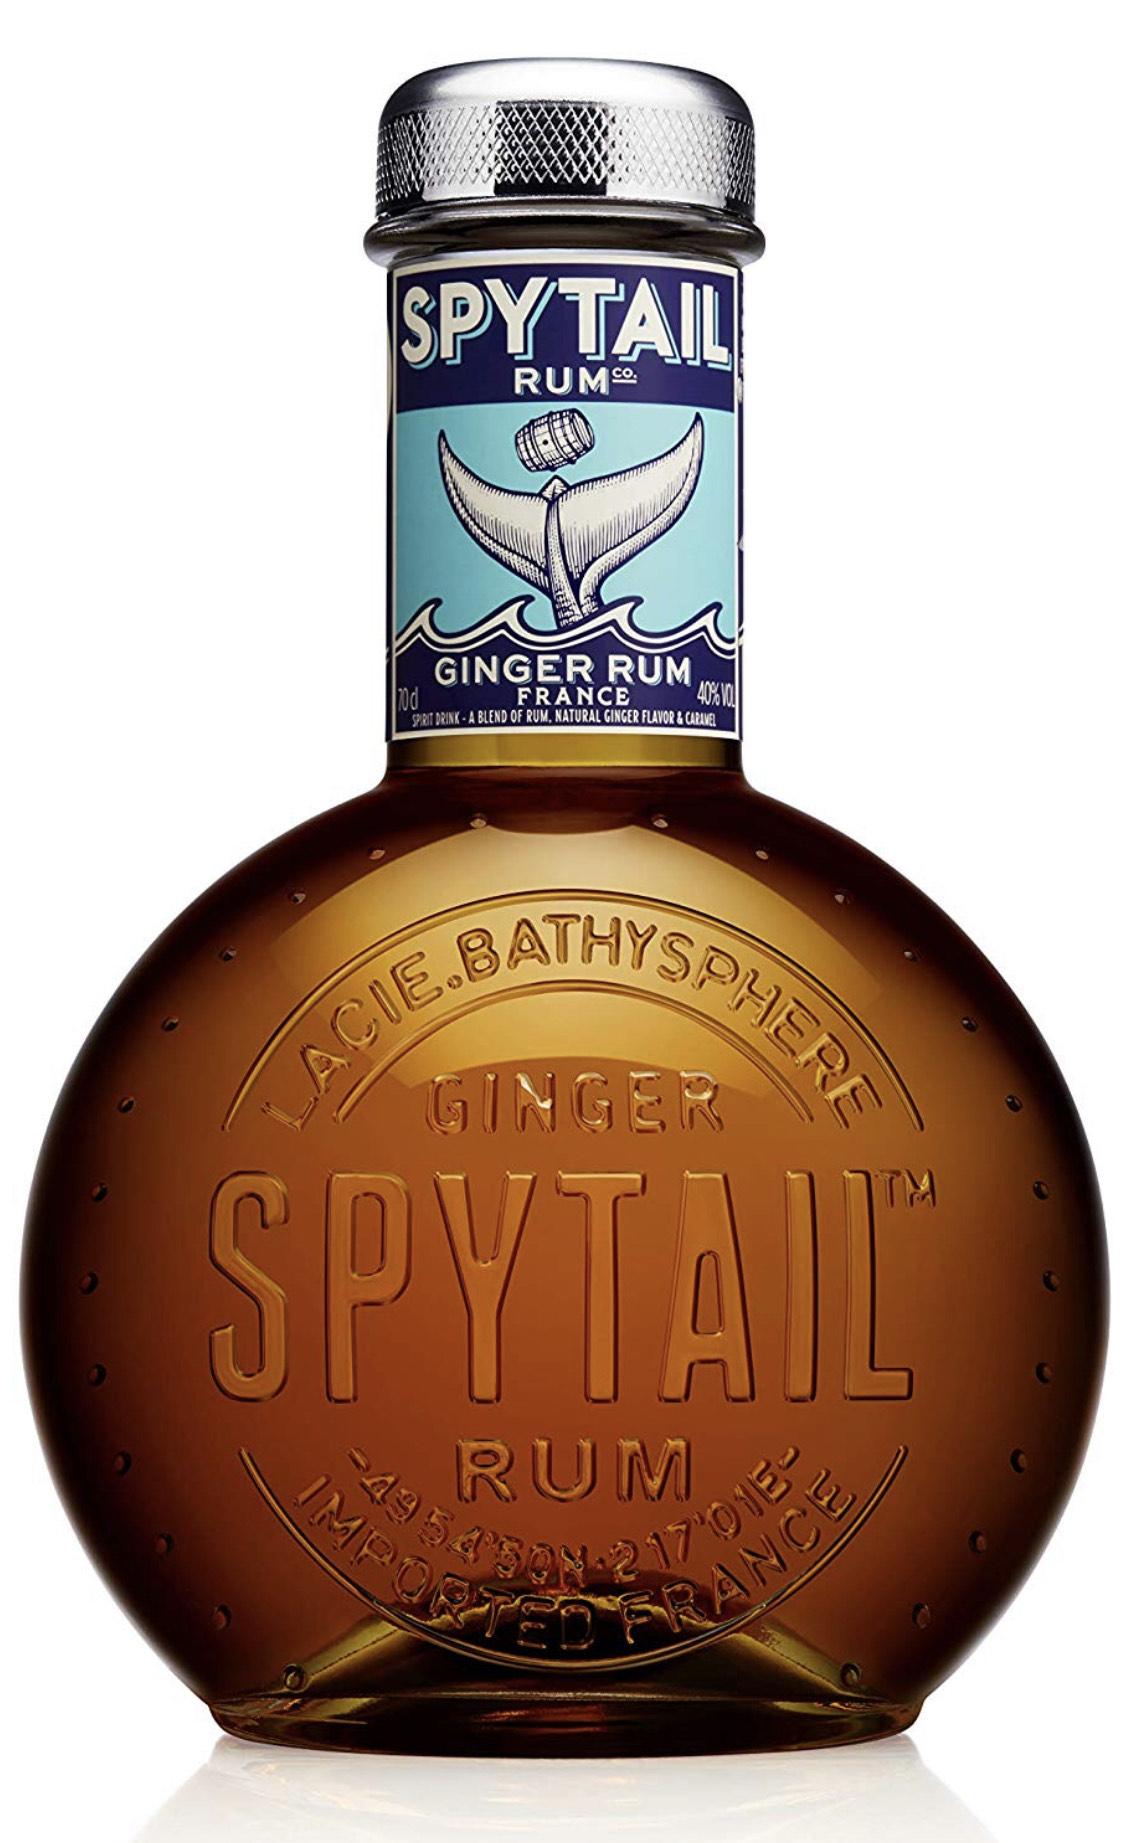 Spytail Ginger Rum, 70 cl £15.49 (Prime) / £19.98 (non Prime) at Amazon